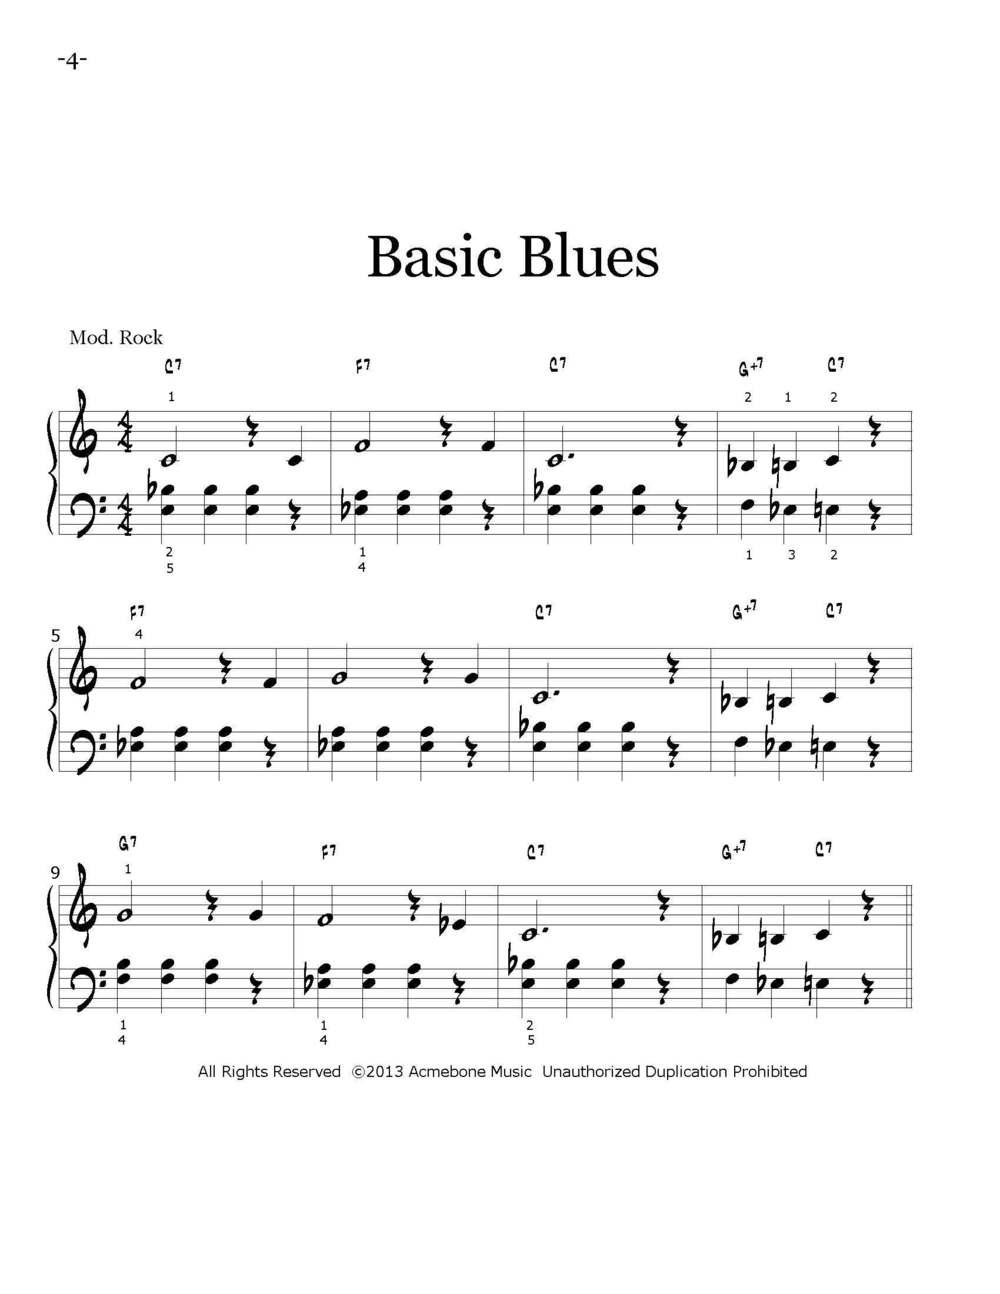 Progressive Jazz Etudes for Piano bk1 for web_Page_05.jpg